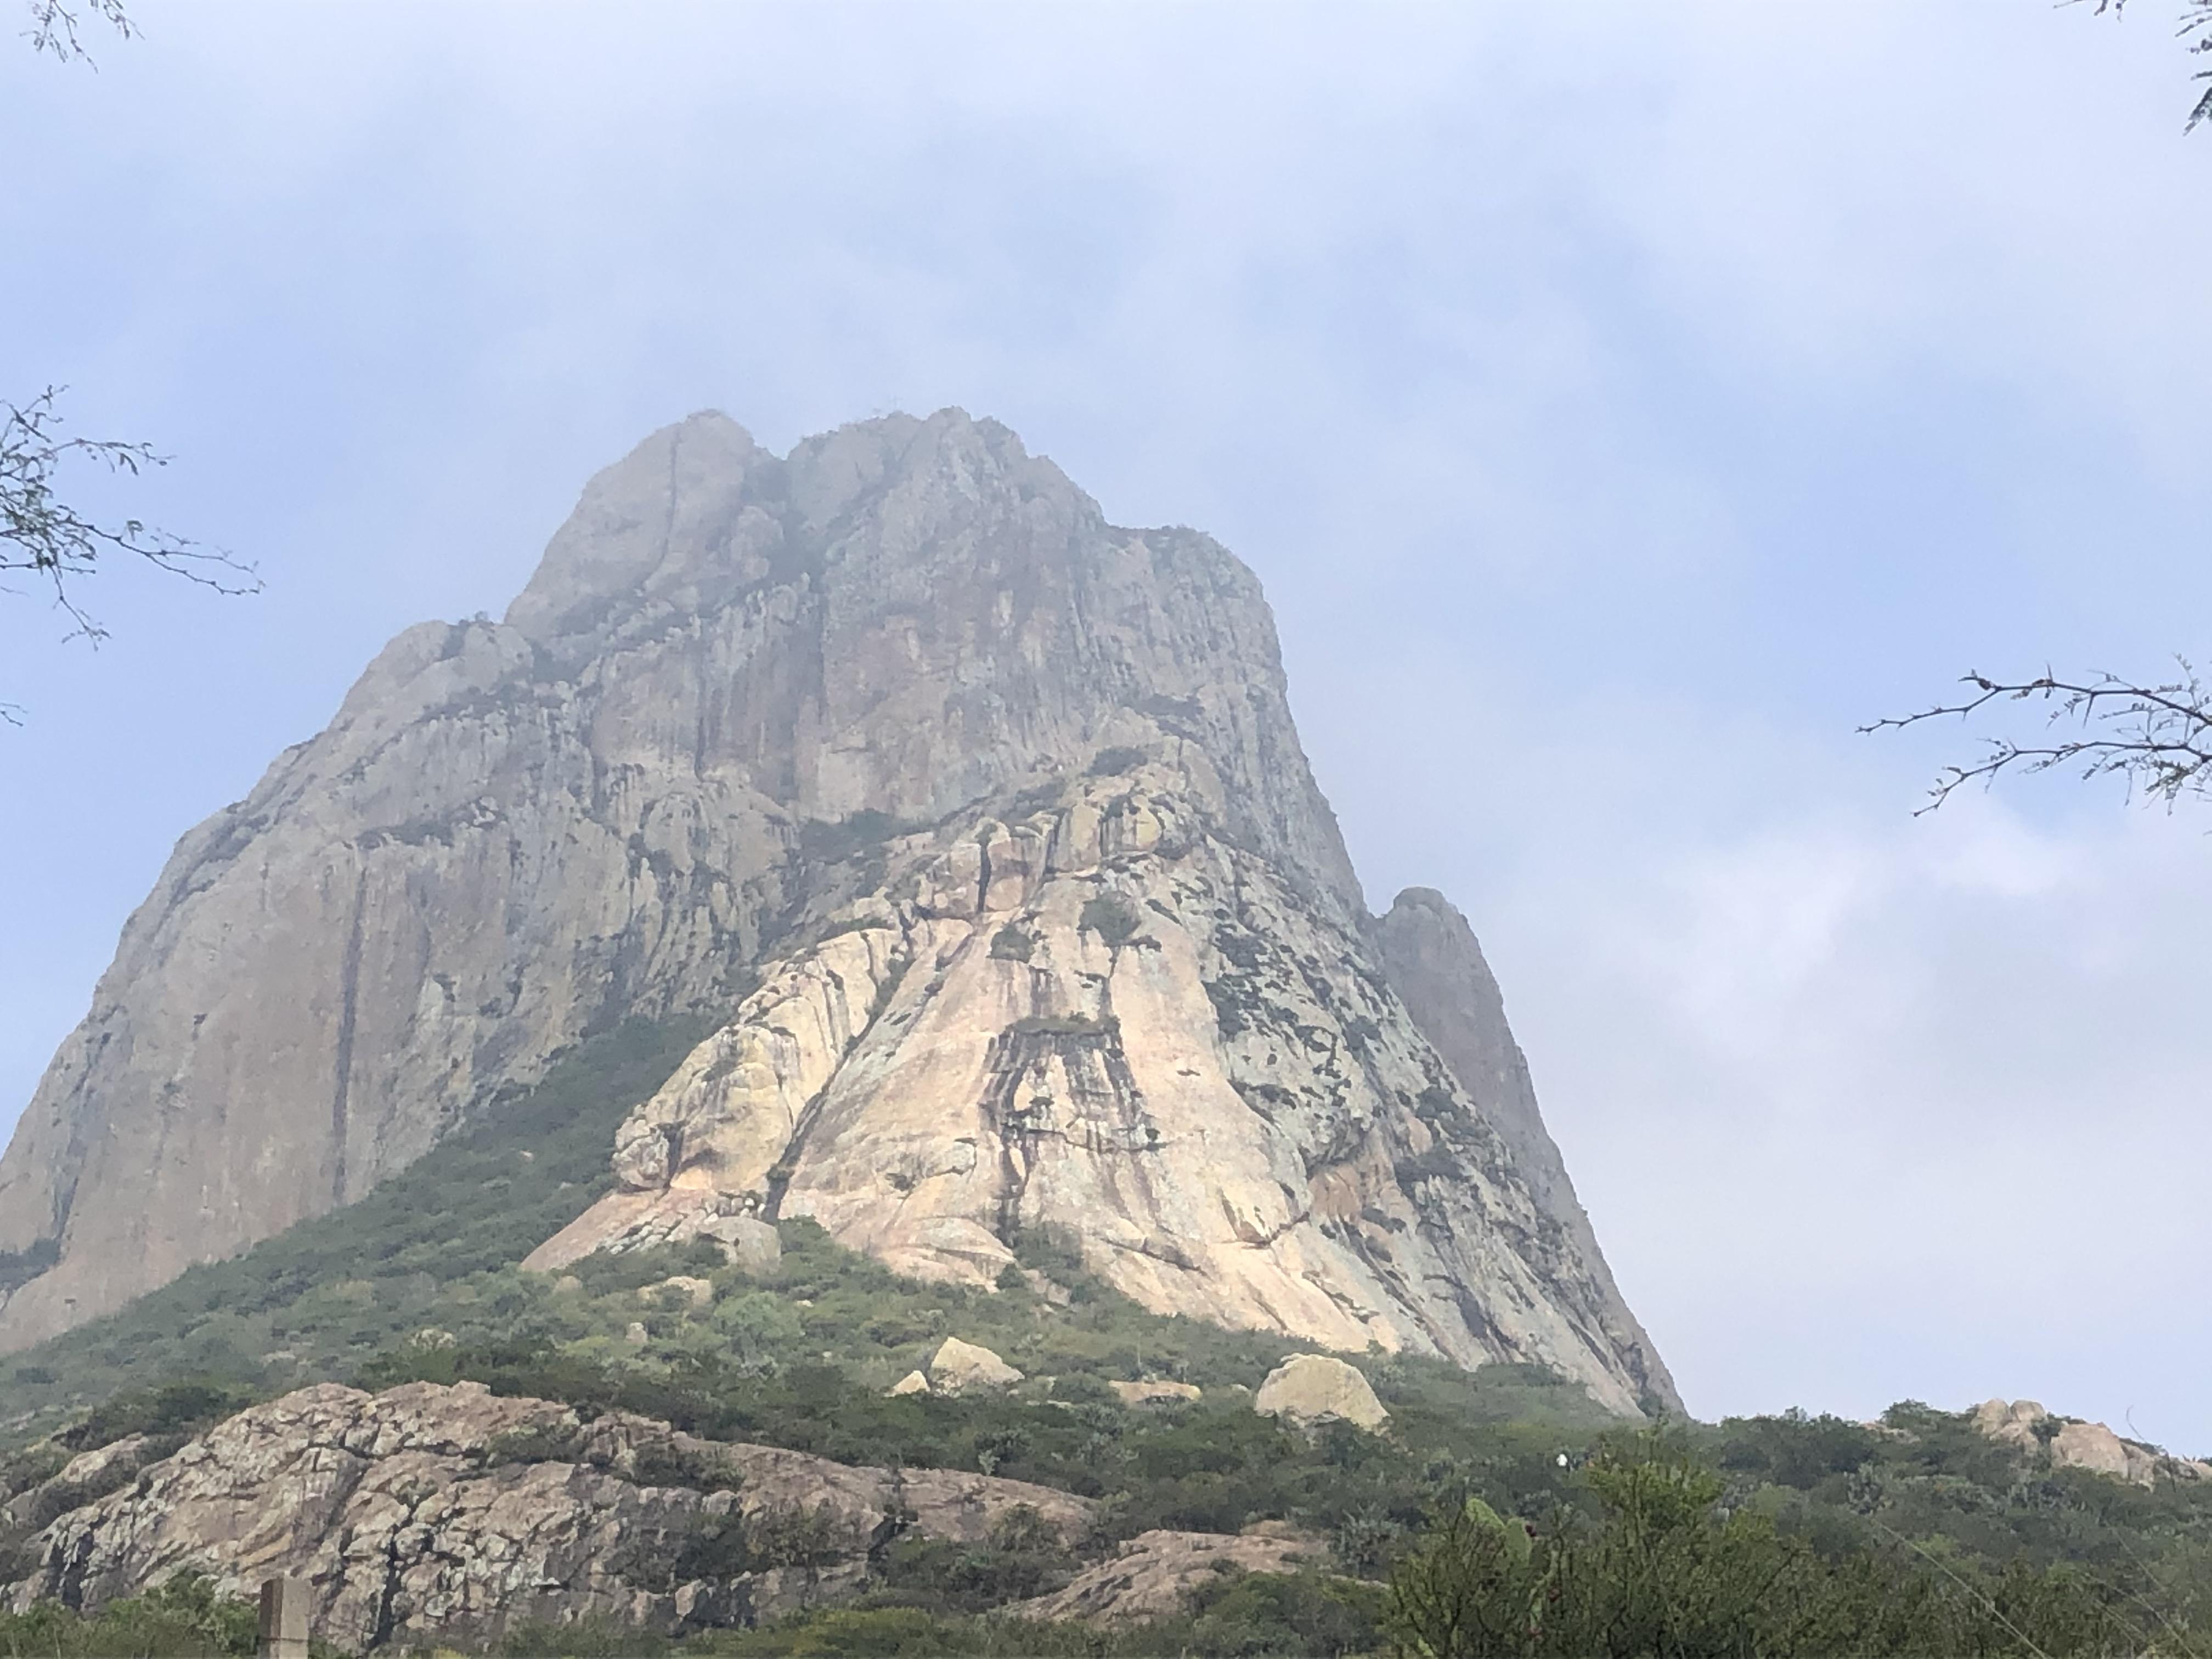 Hombre que falleció en Peña de Bernal escalaba por espacio restringido